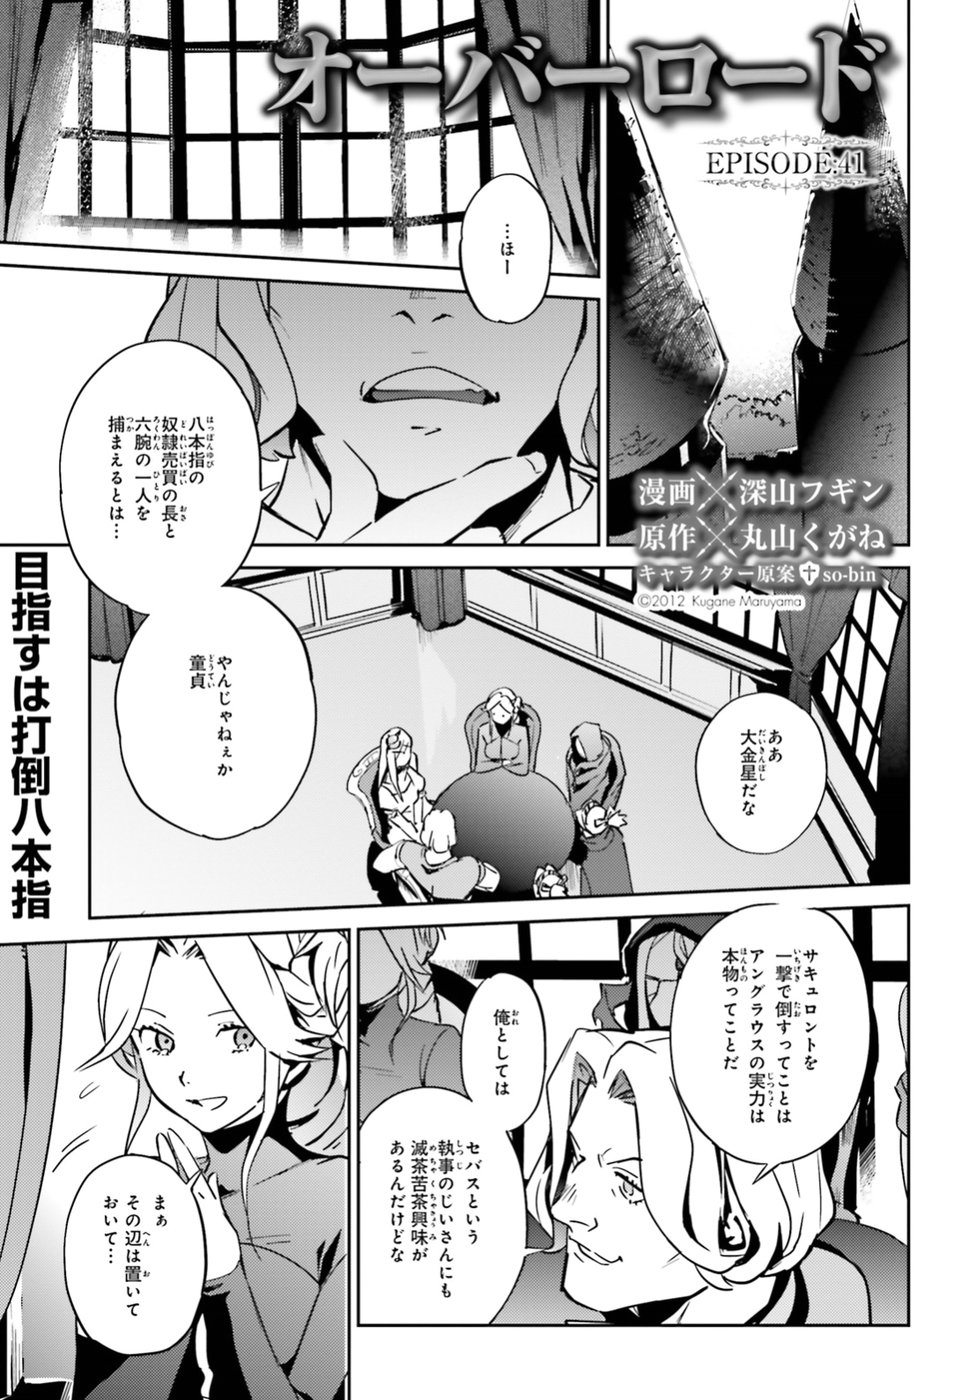 Overlord Manga Chapter 41